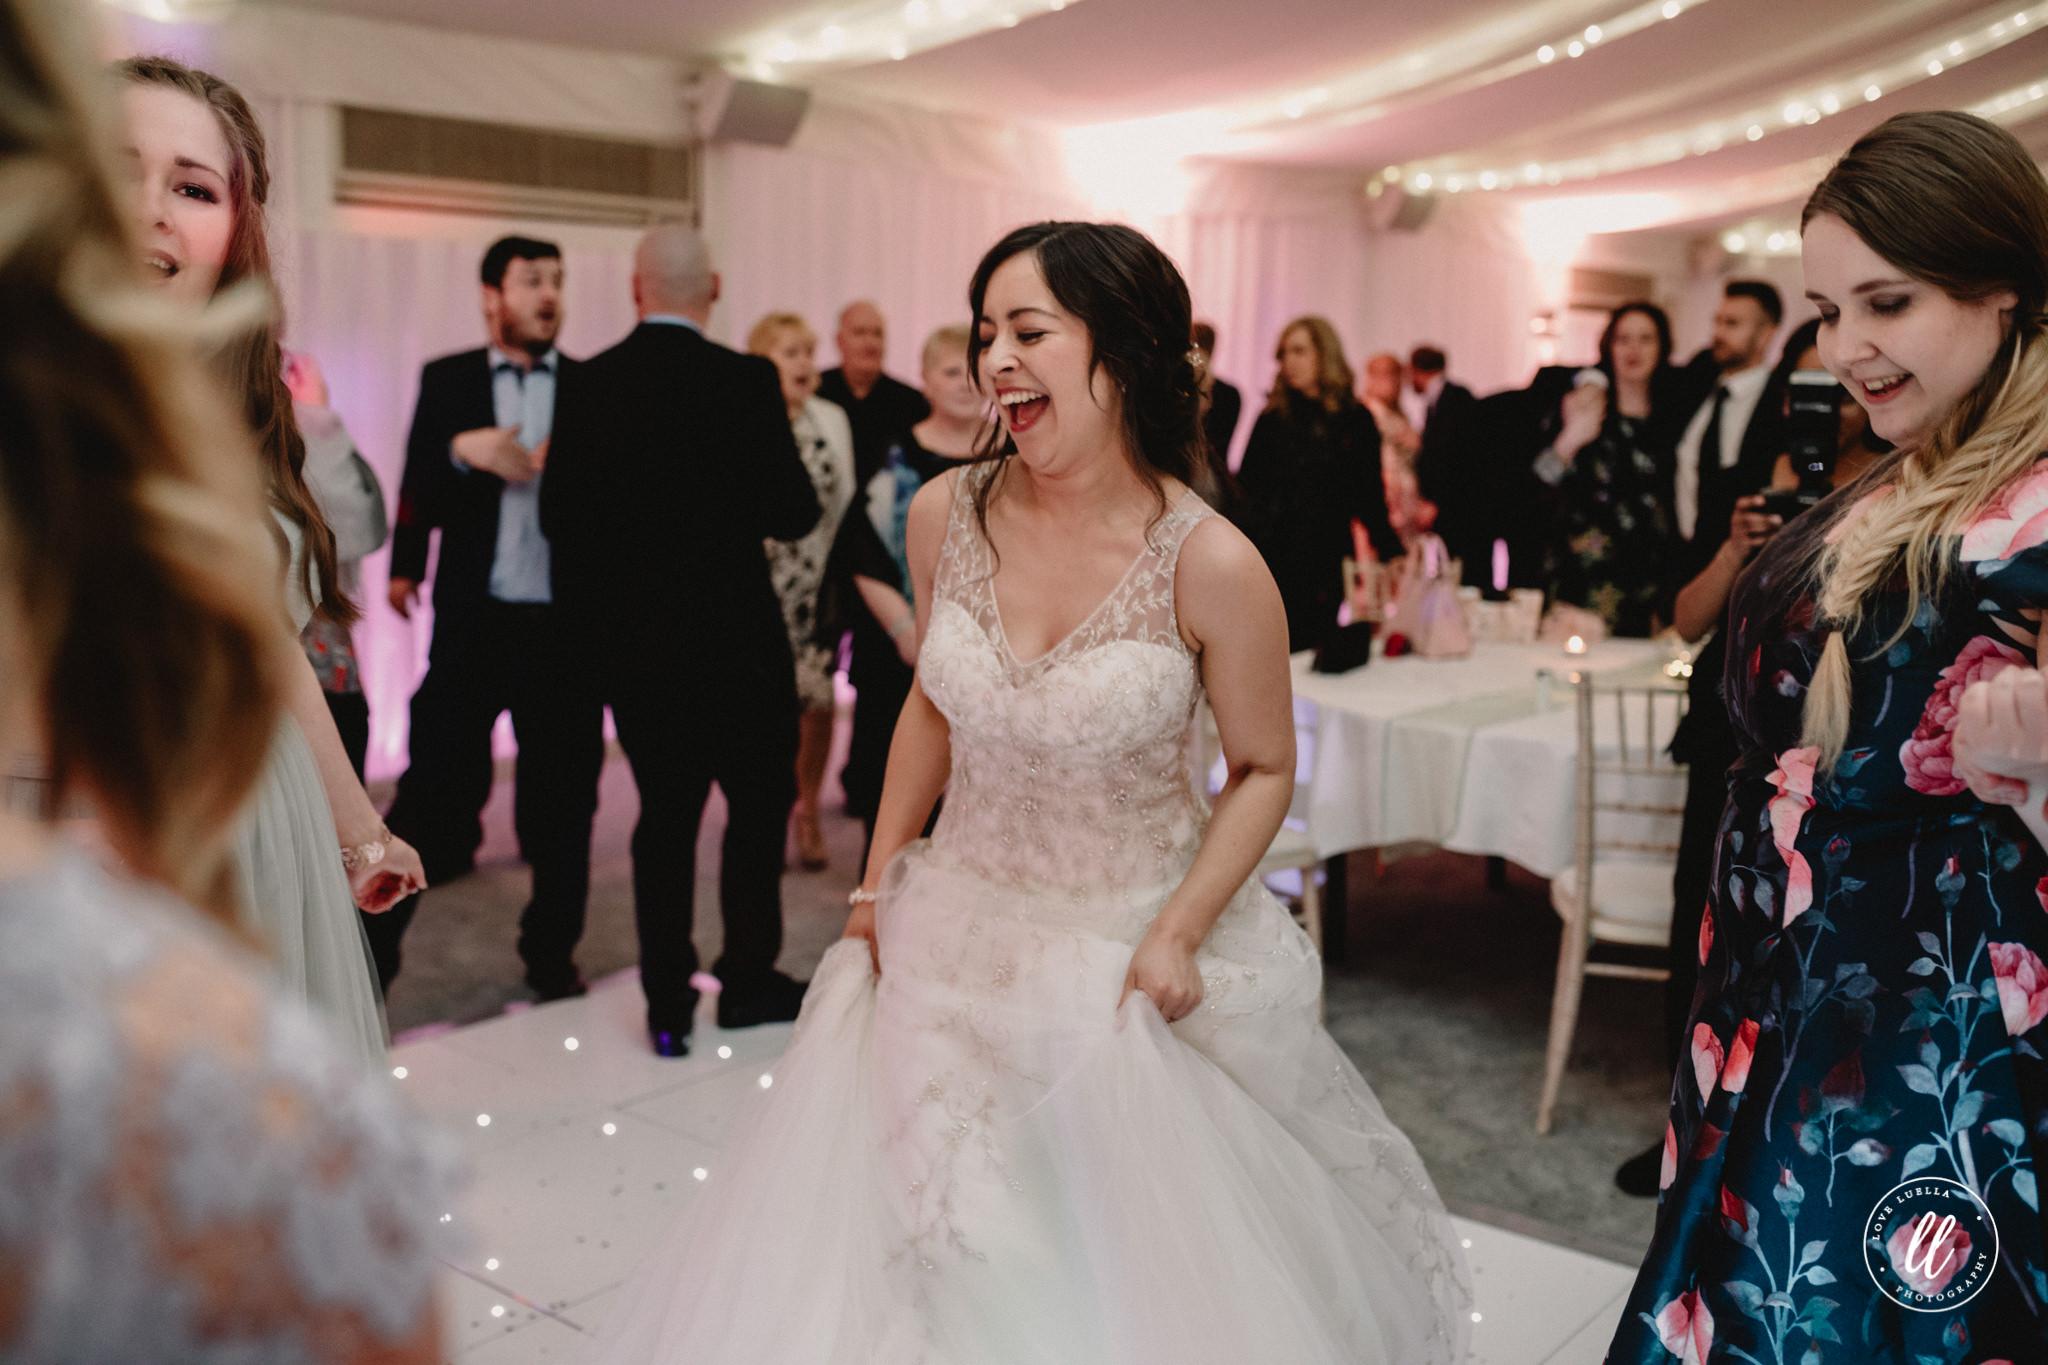 Celtic Manor Resort Wedding Photographer (42 of 47).jpg